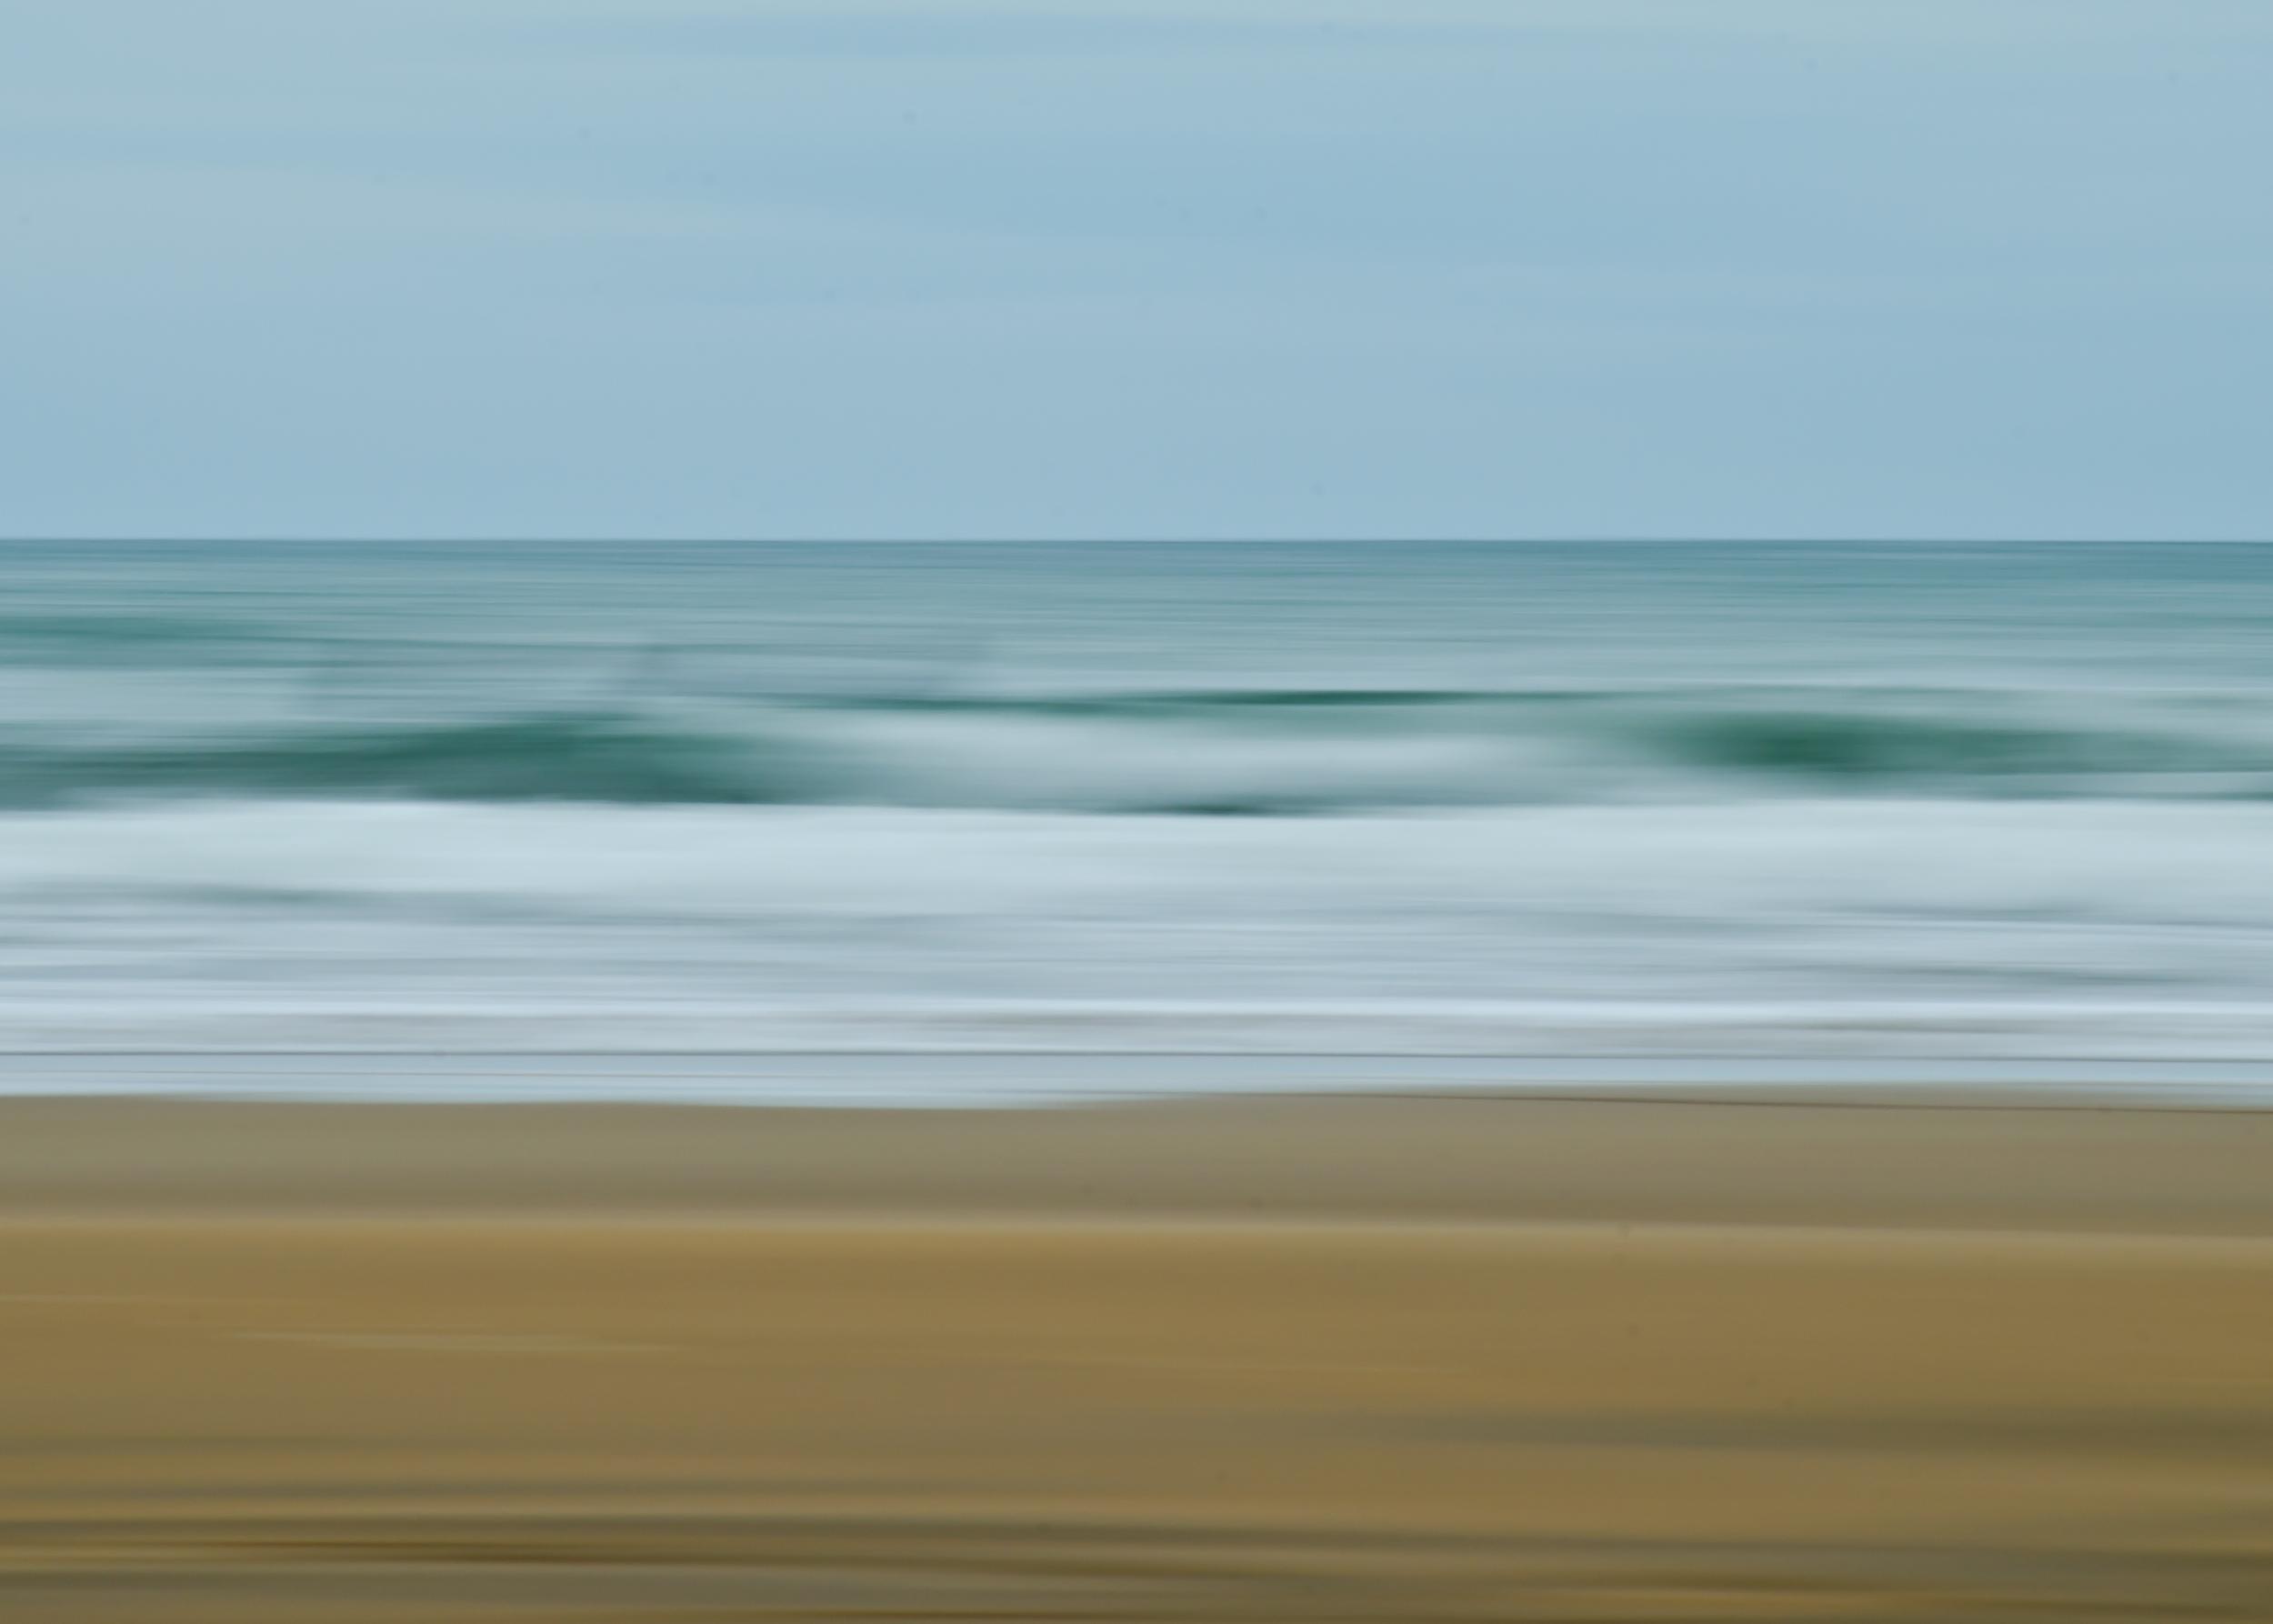 Sandymouth Beach Abstract